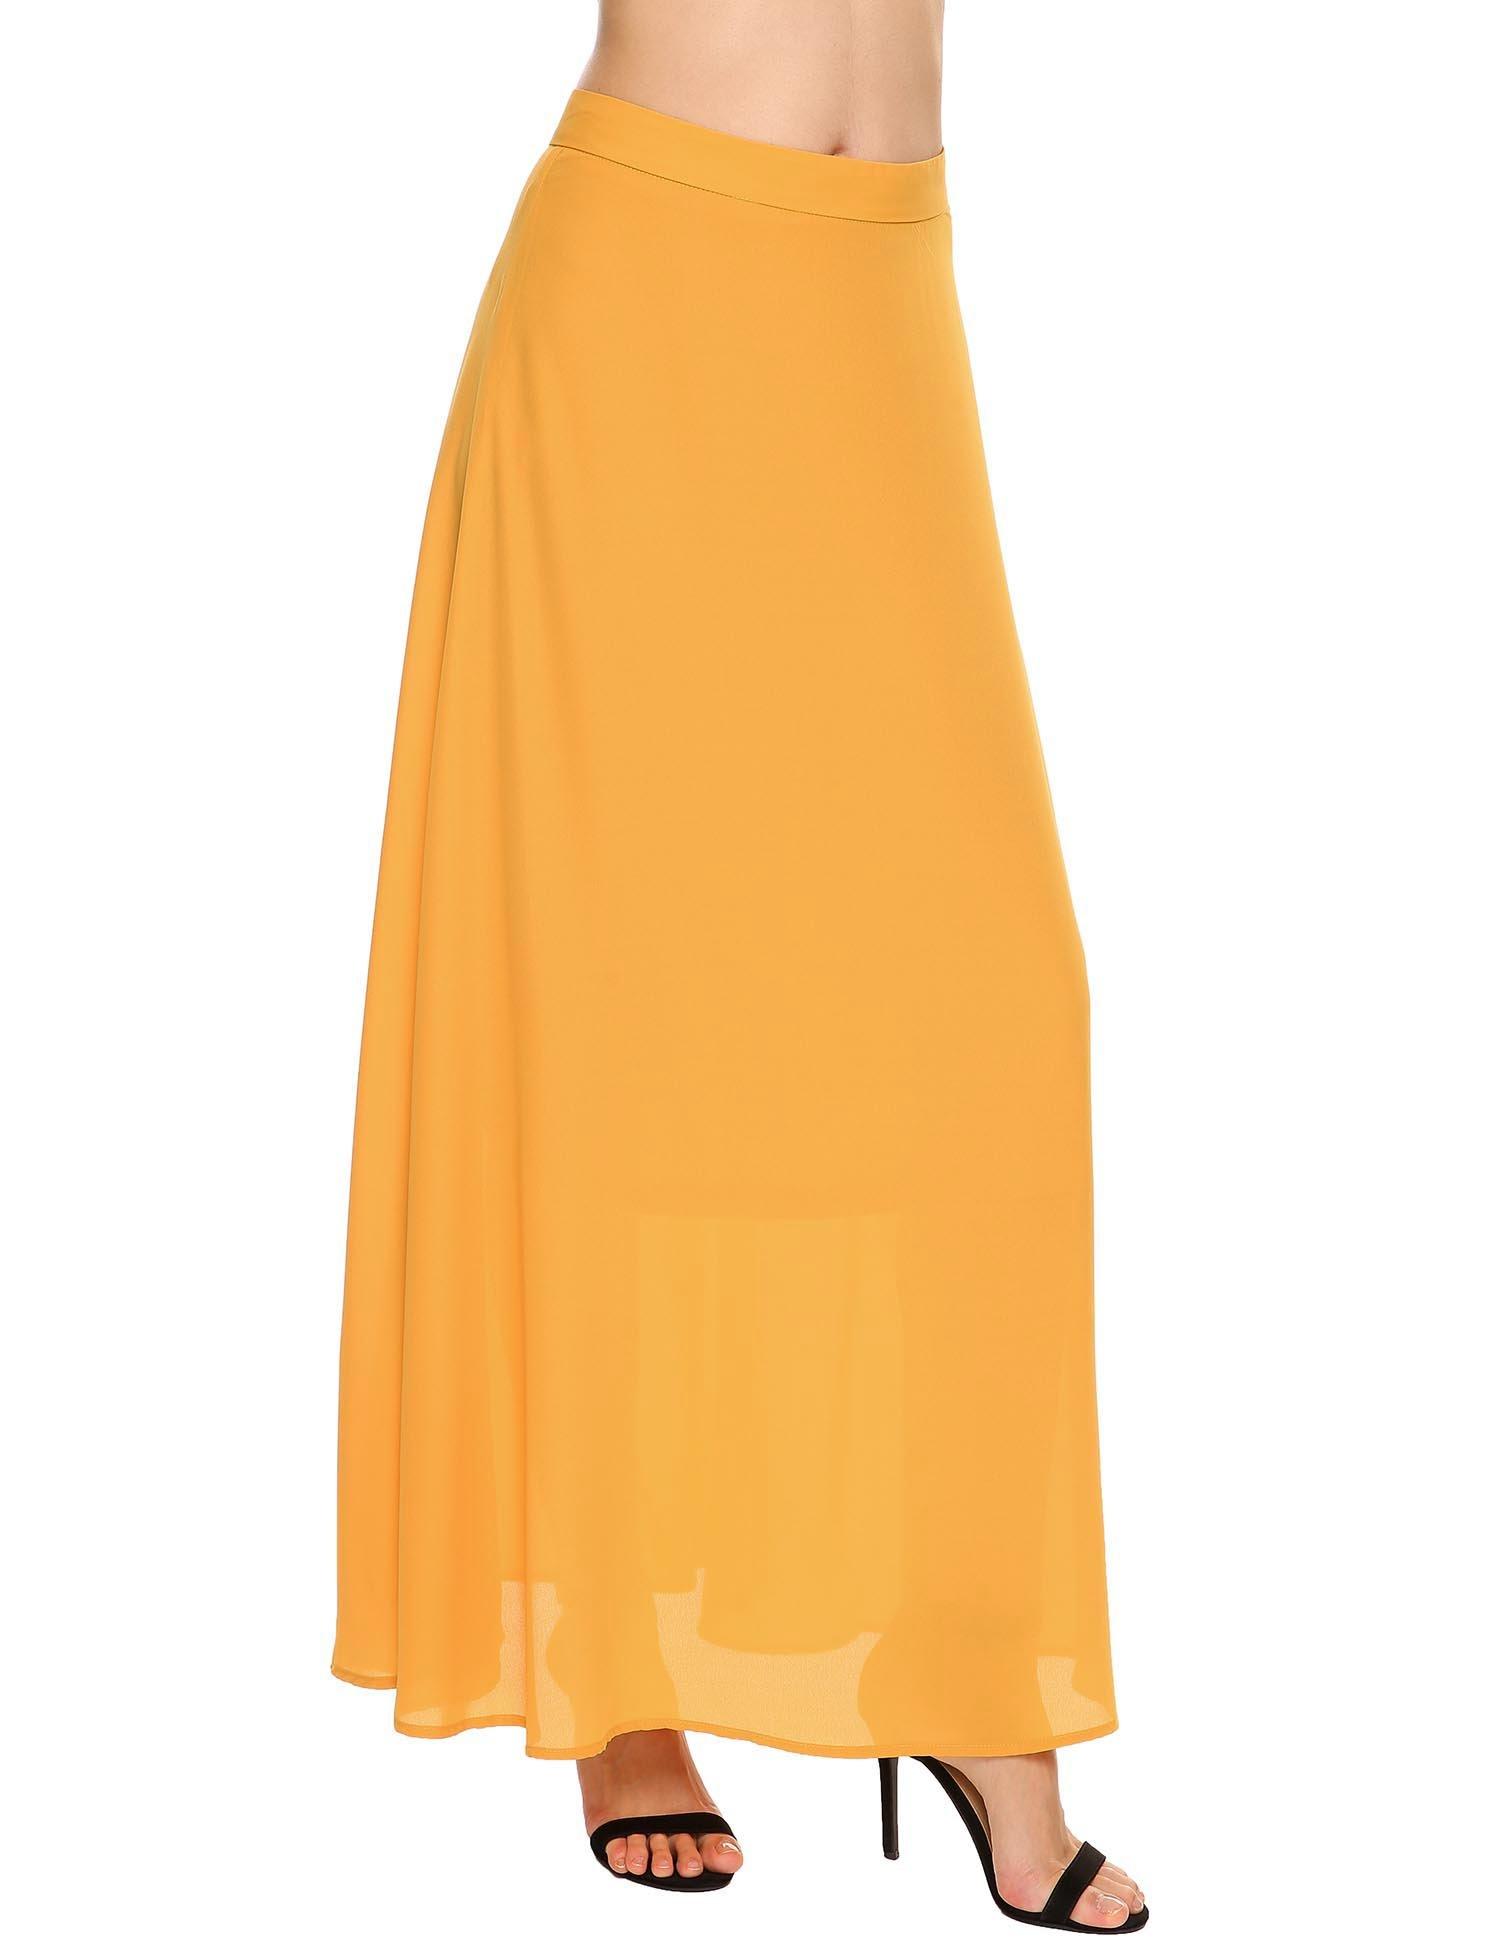 Chigant Women Classic Chiffon Maxi Long Skirt Ankle Length Beach Skirt(Not Elastic Waist), Yellow, M